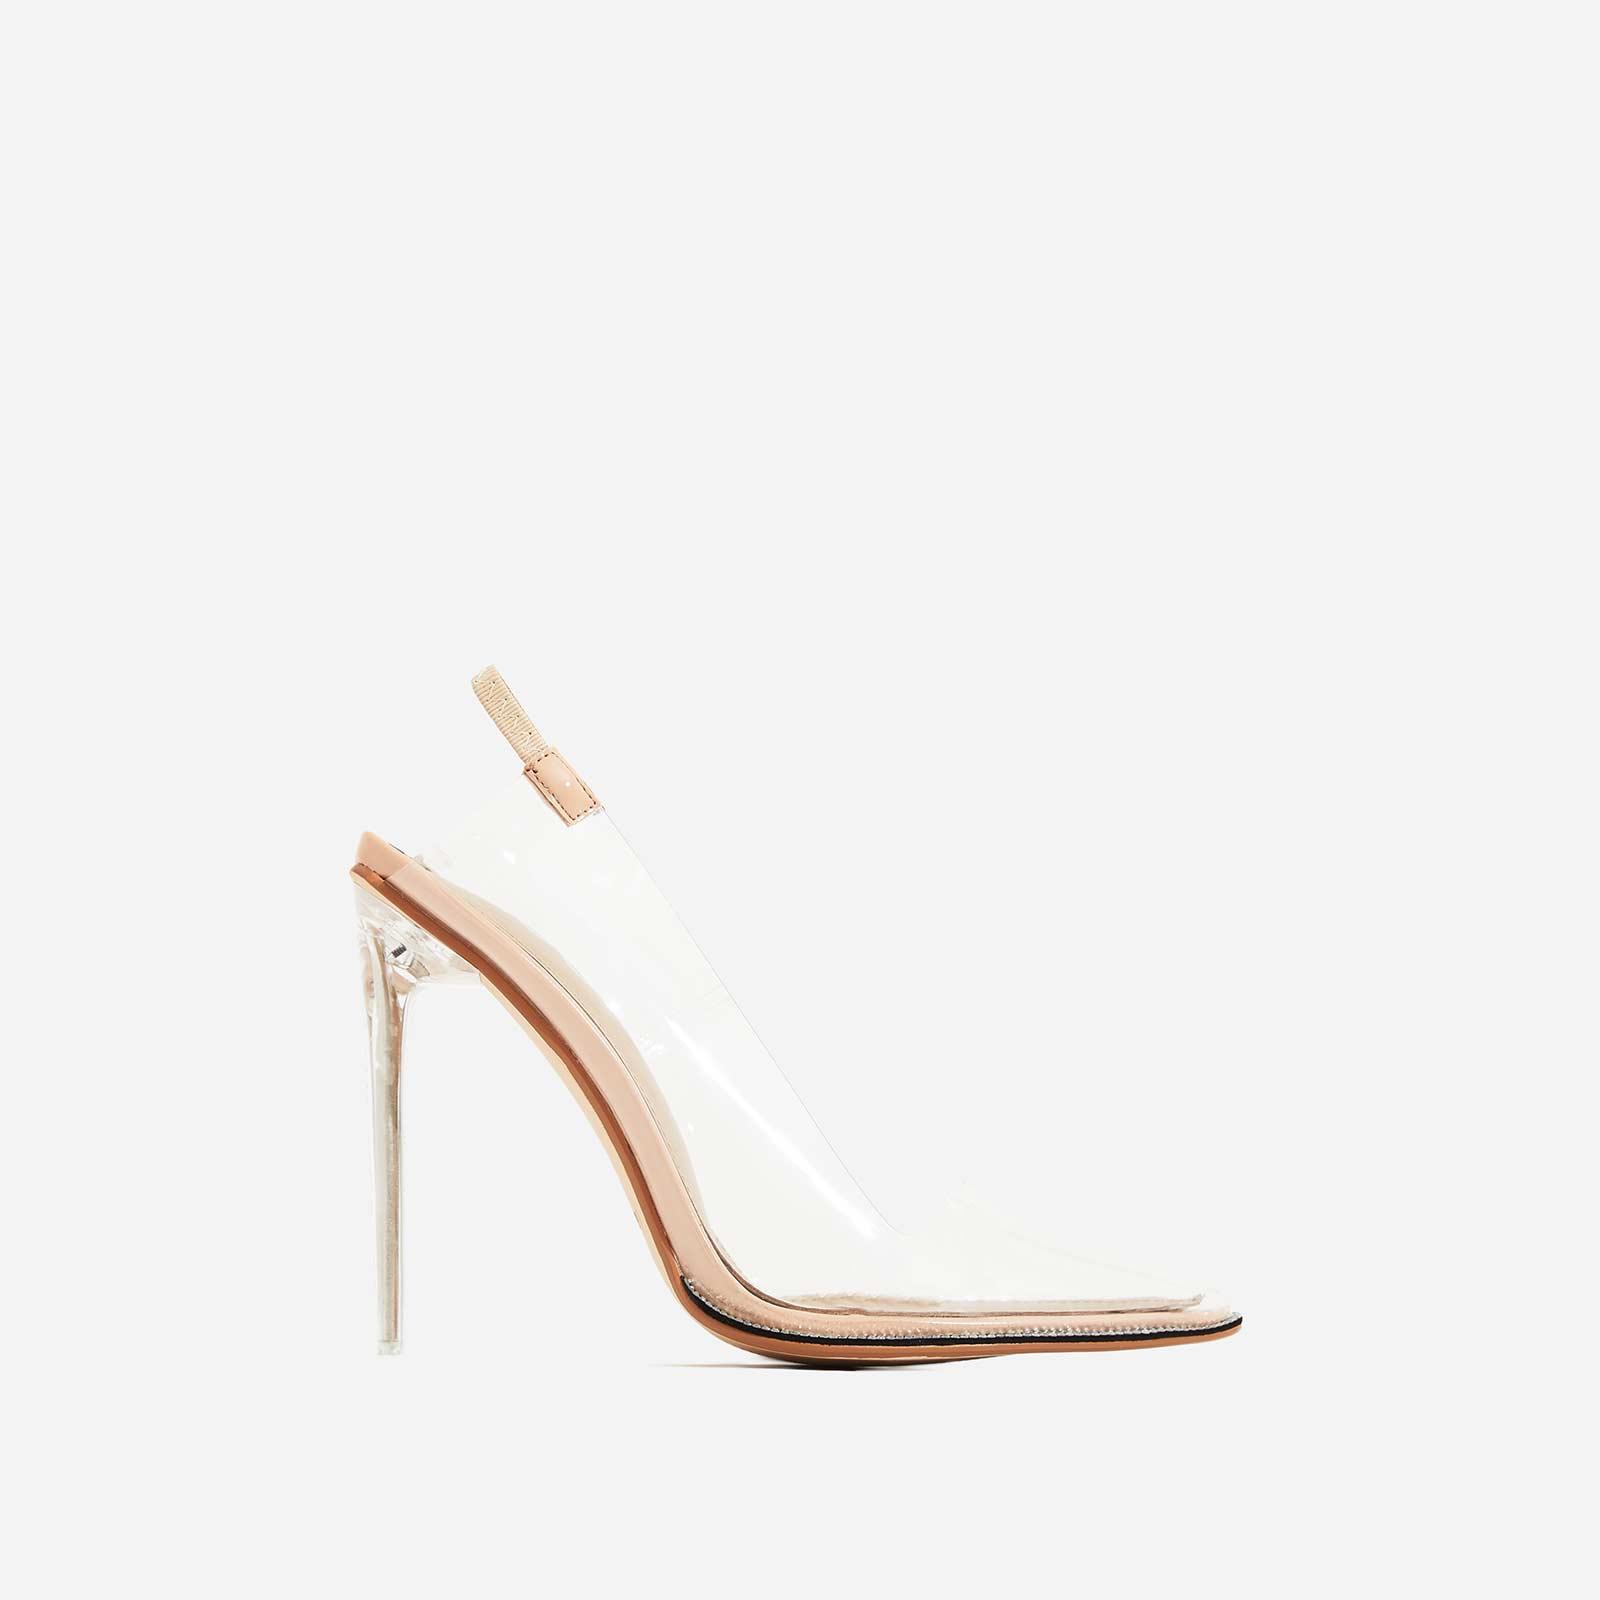 Amor Perspex Diamante Detail Heel In Nude Patent